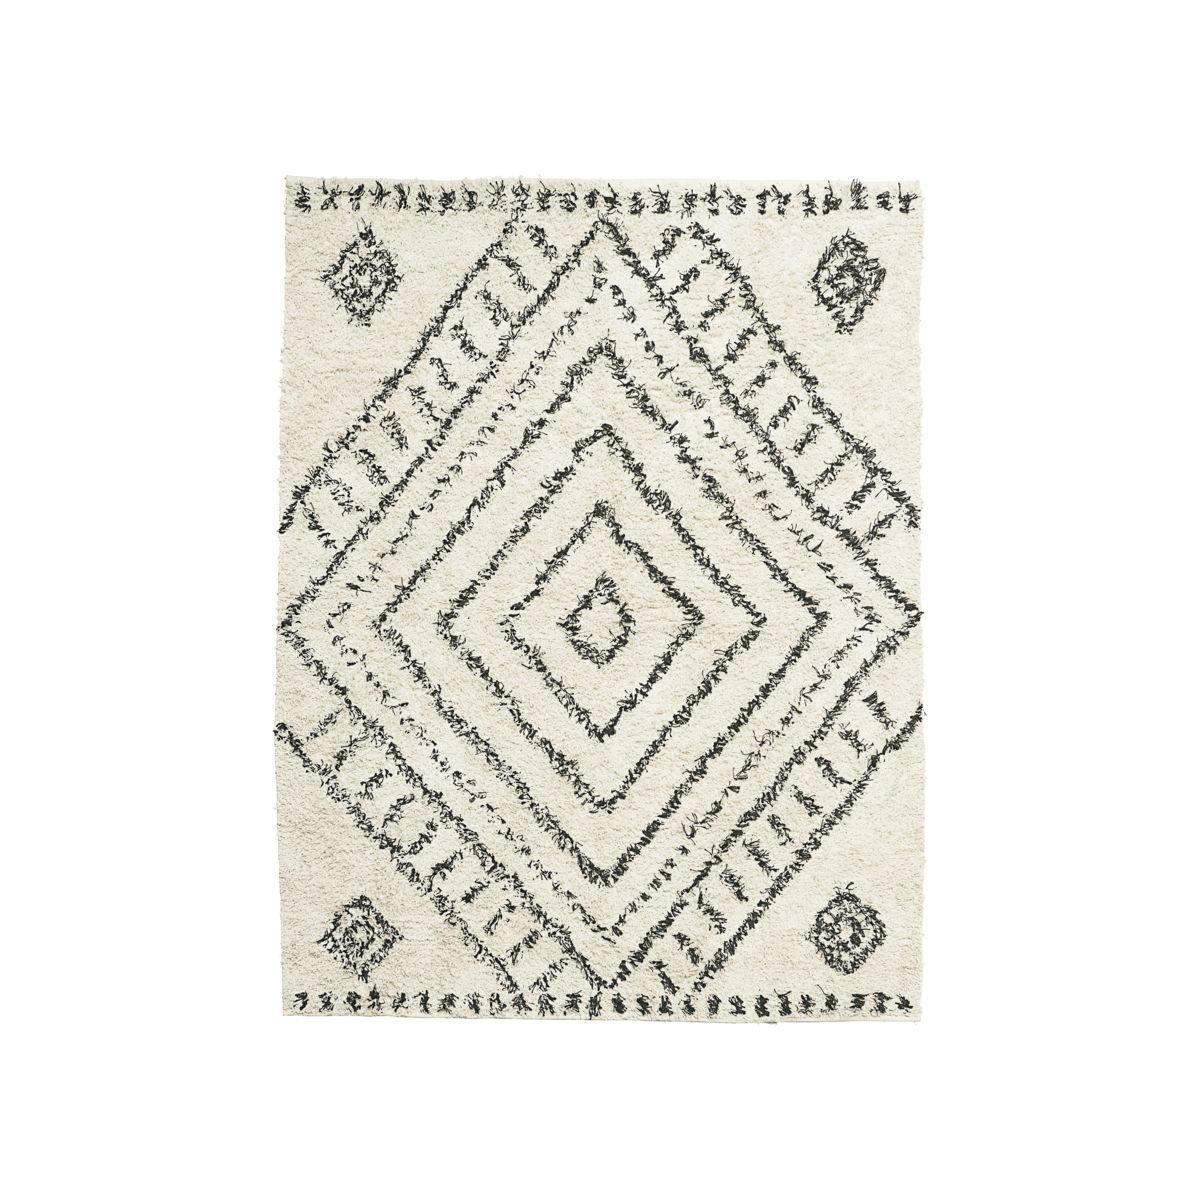 House Doctor Koberec Nubia 210x160, černá barva, bílá barva, textil